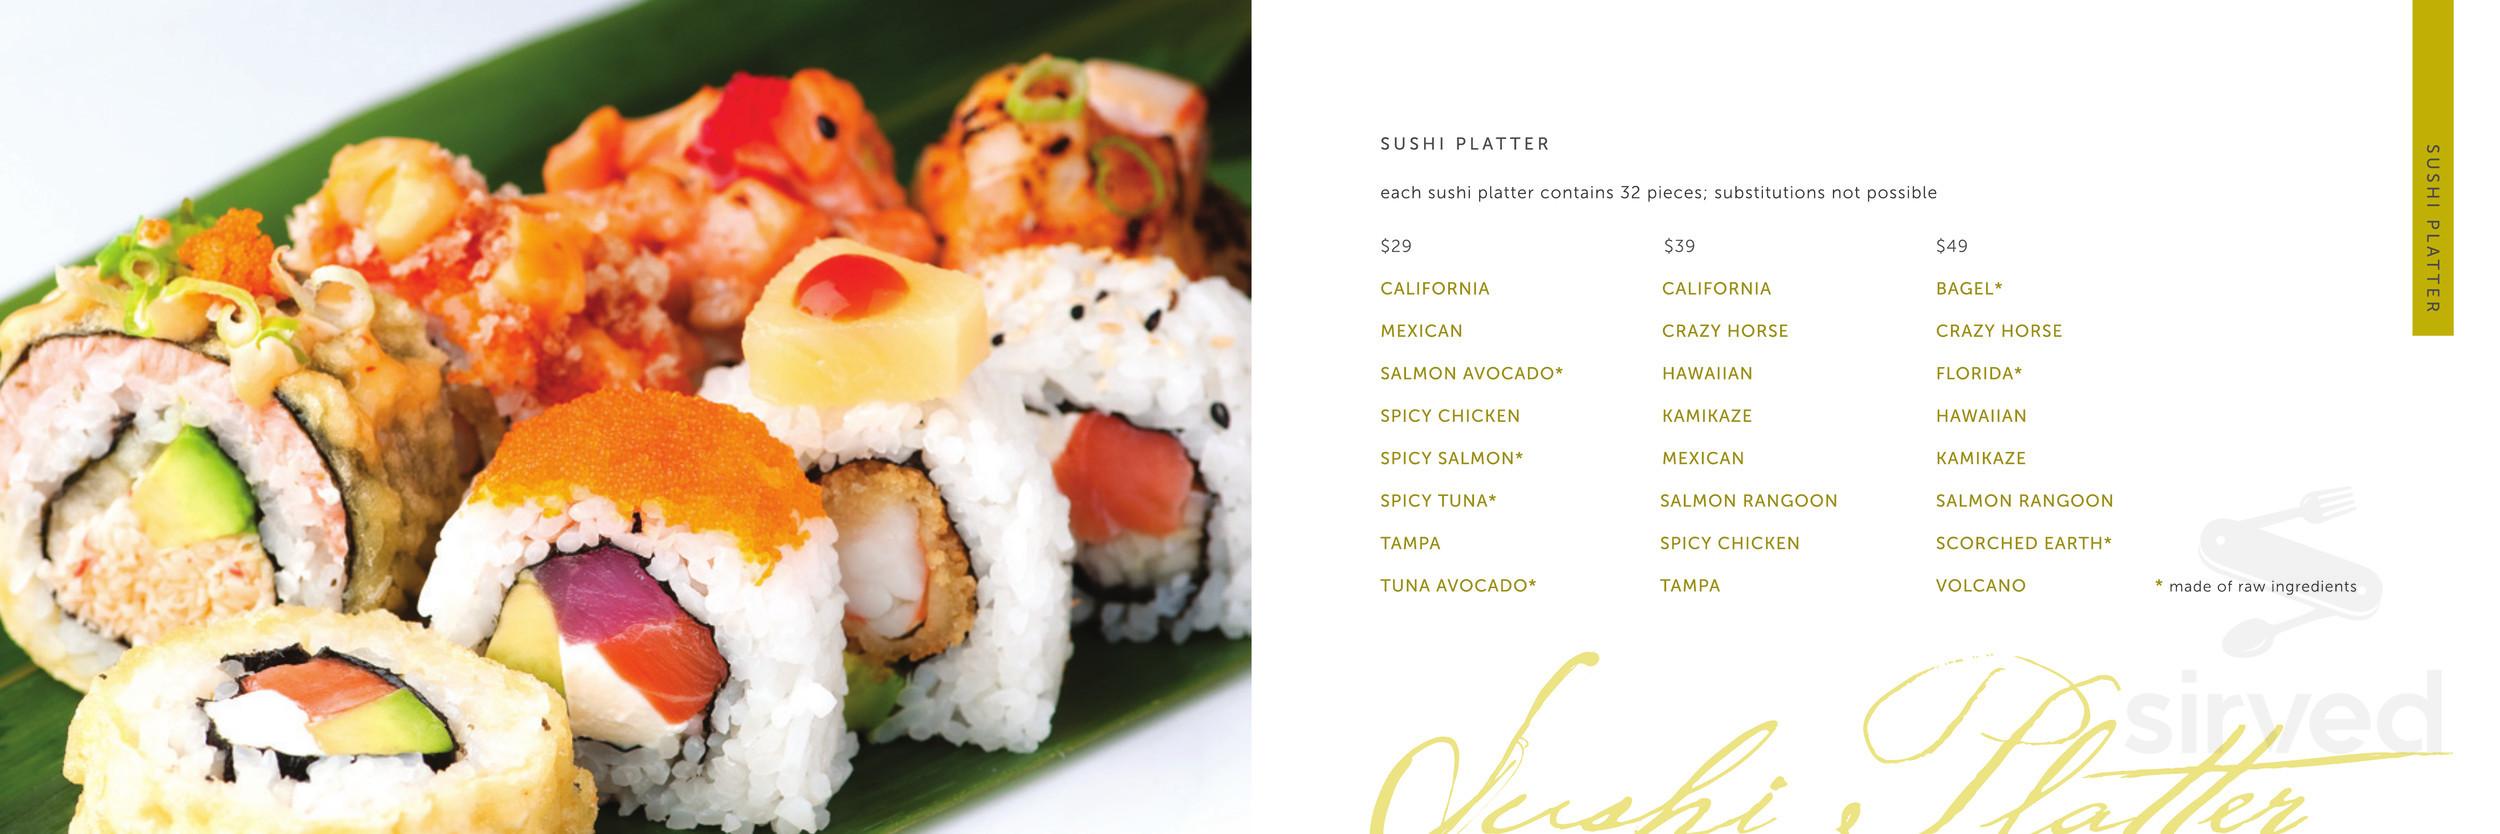 Origami Sushi - Tampa Florida Restaurant - HappyCow | 834x2500